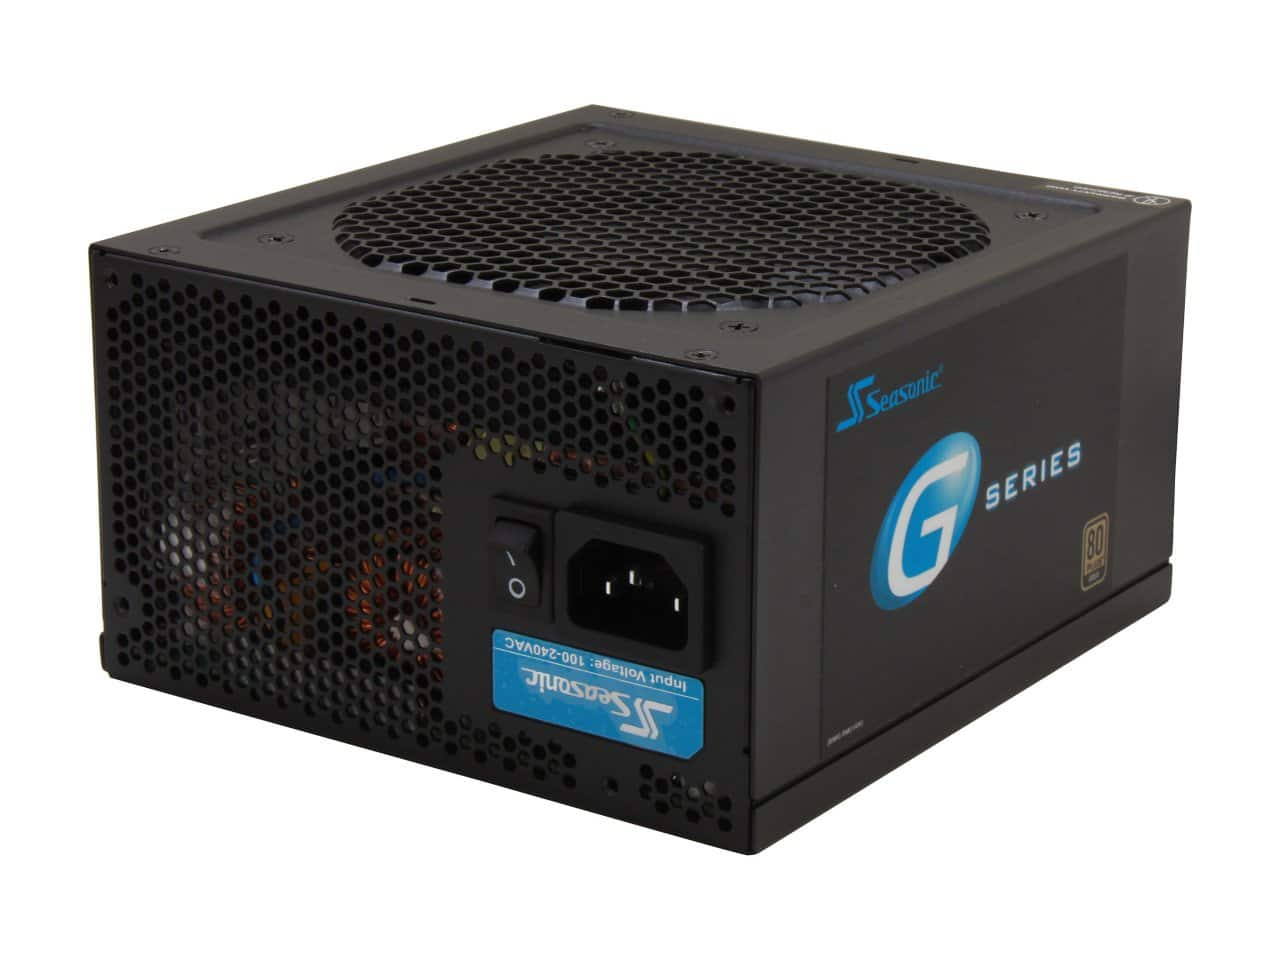 550 Watt SeaSonic G550 80 Plus Gold Certified Semi-Modular Active PFC Power Supply for $58.99 AR + Free Shipping @ Newegg.com